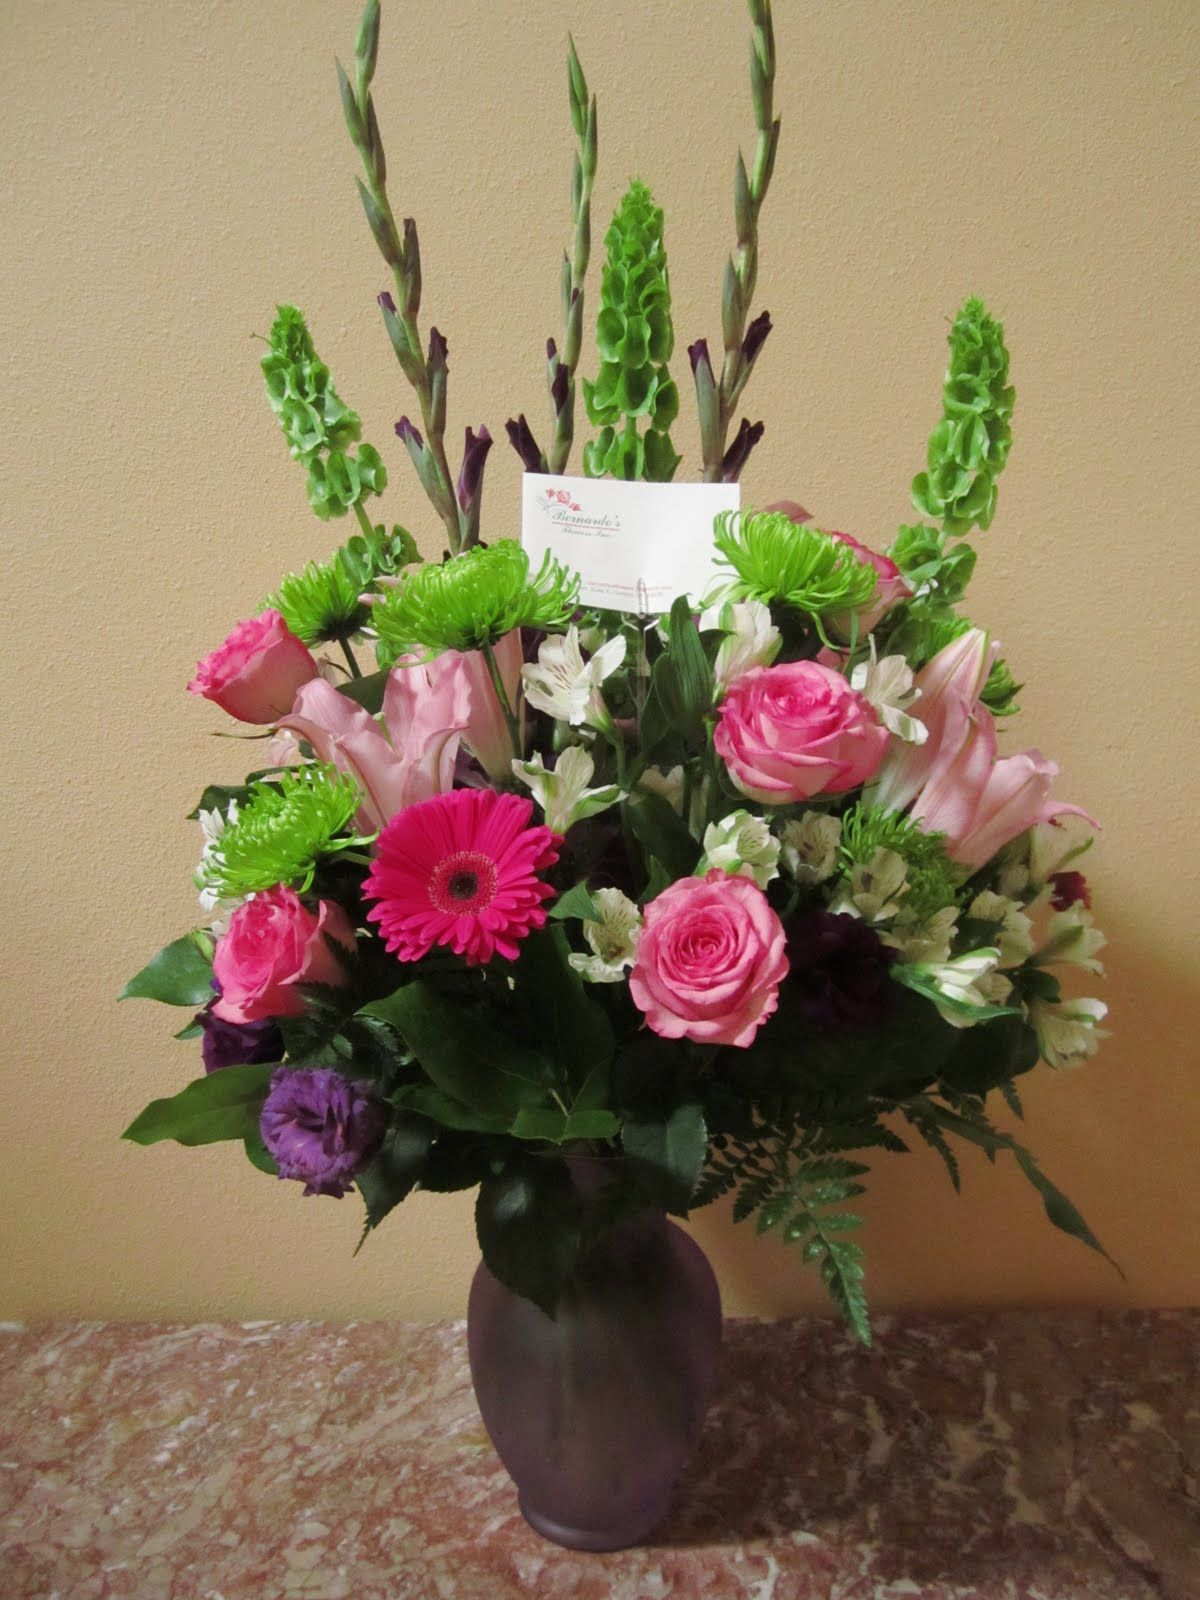 Flower arrangements for january spring mix flower vase arr flower arrangements for january spring mix flower vase arr mightylinksfo